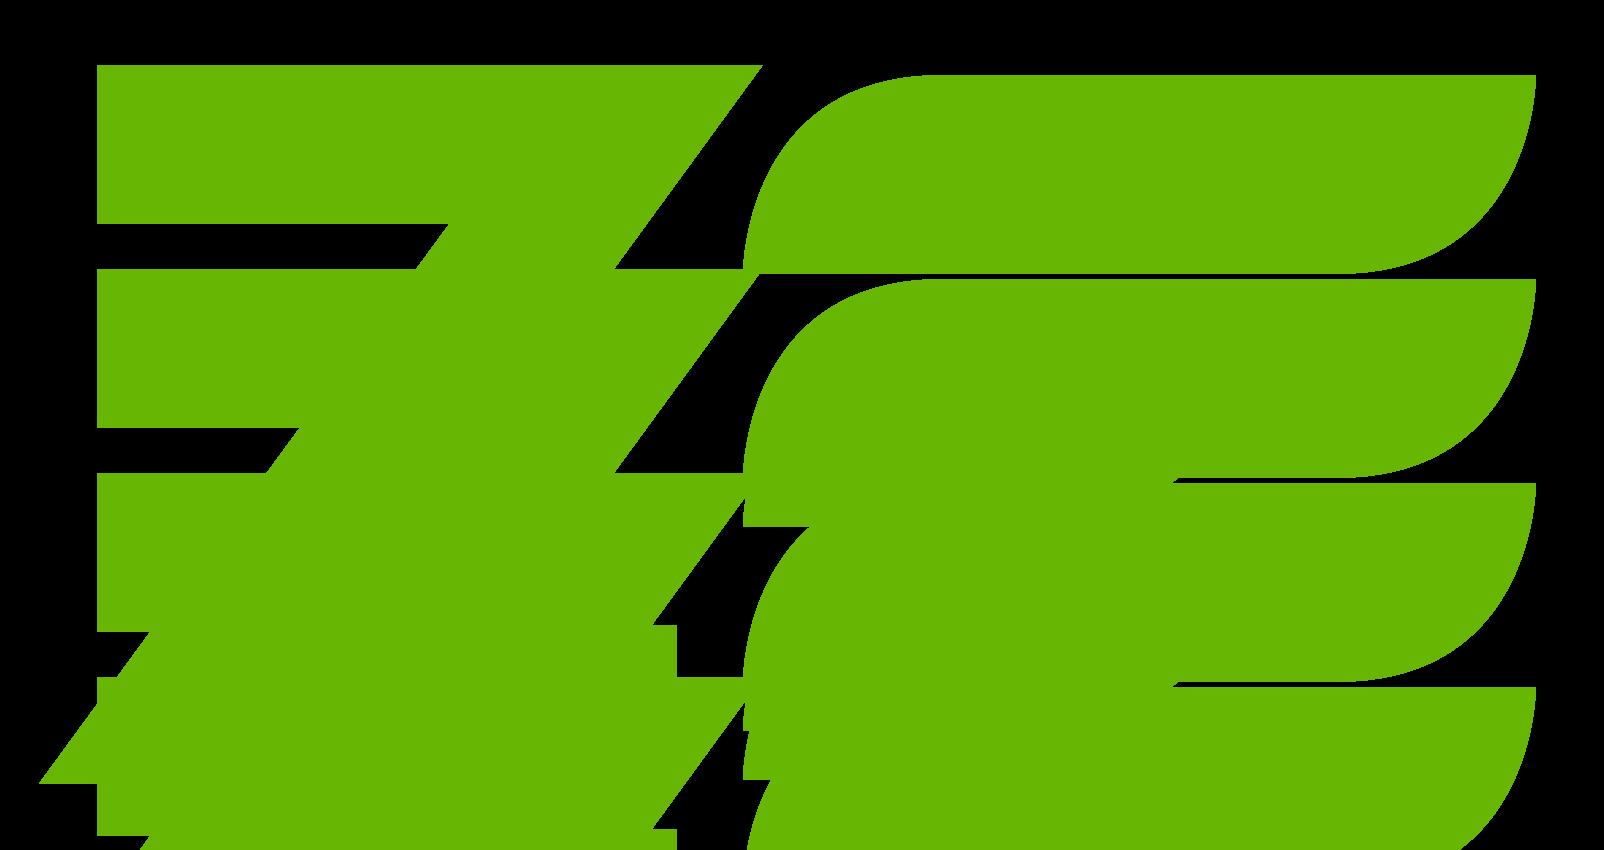 Zend Framework, Zend Framework 2, Zend Framework 3